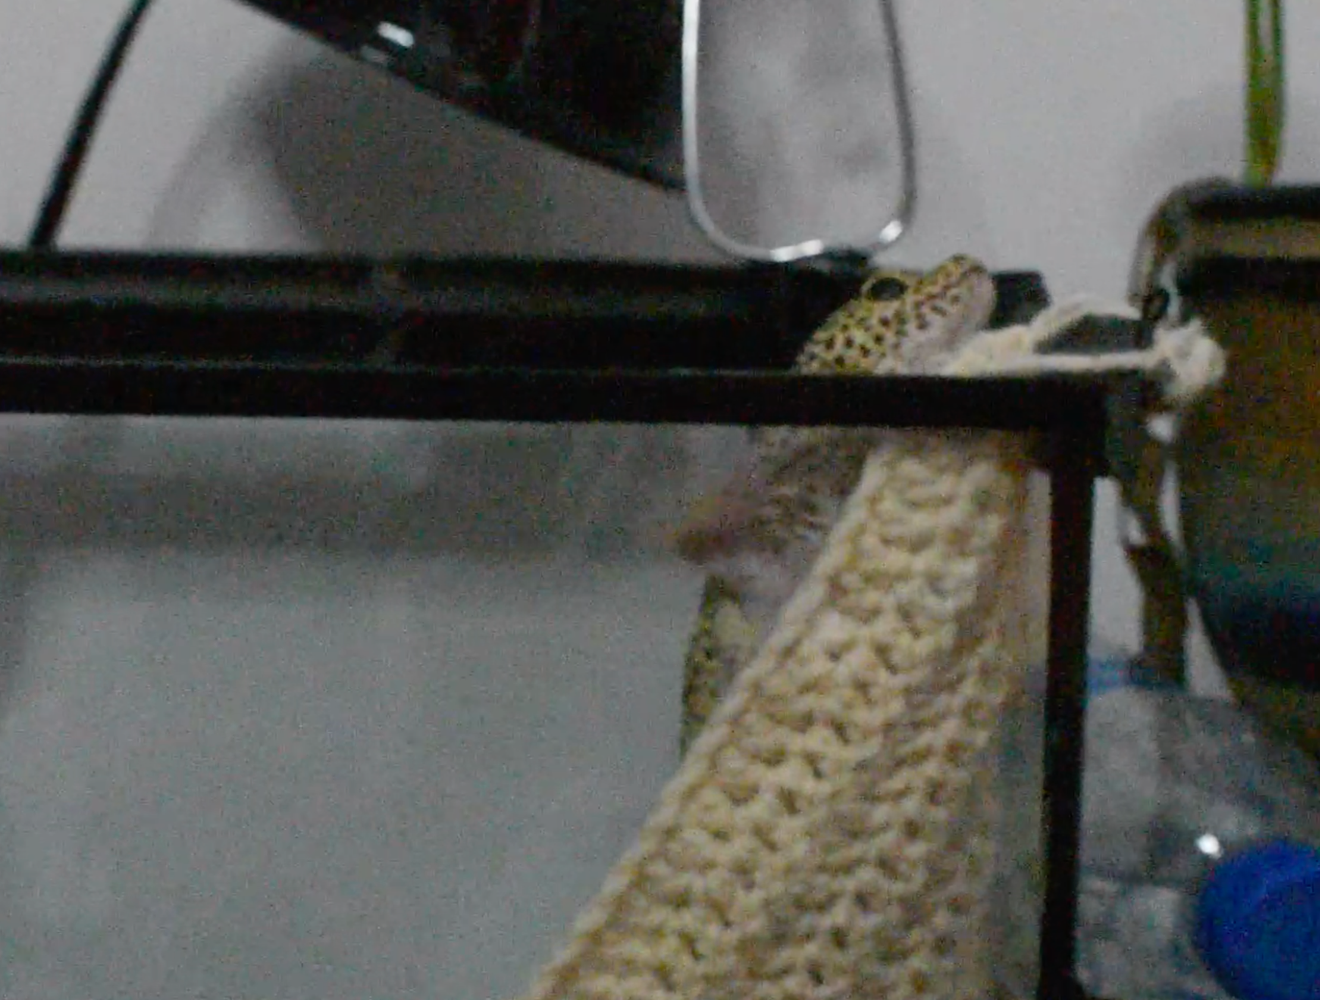 A lizard climbing out of his tank